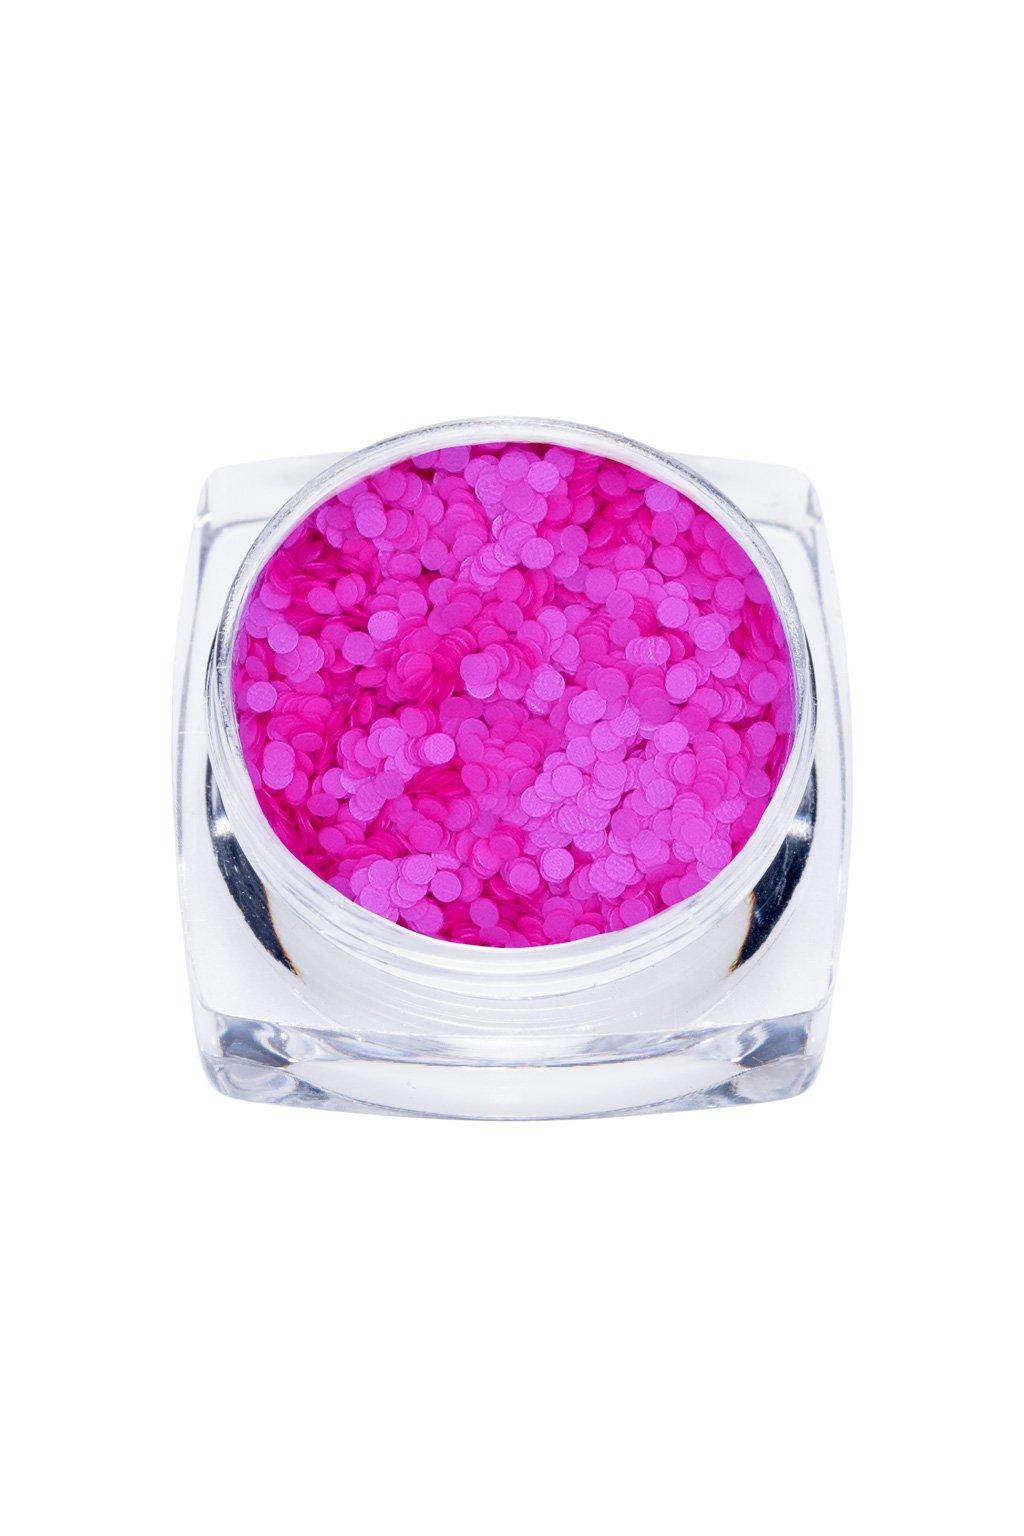 23969 minipihy neon pink 1mm